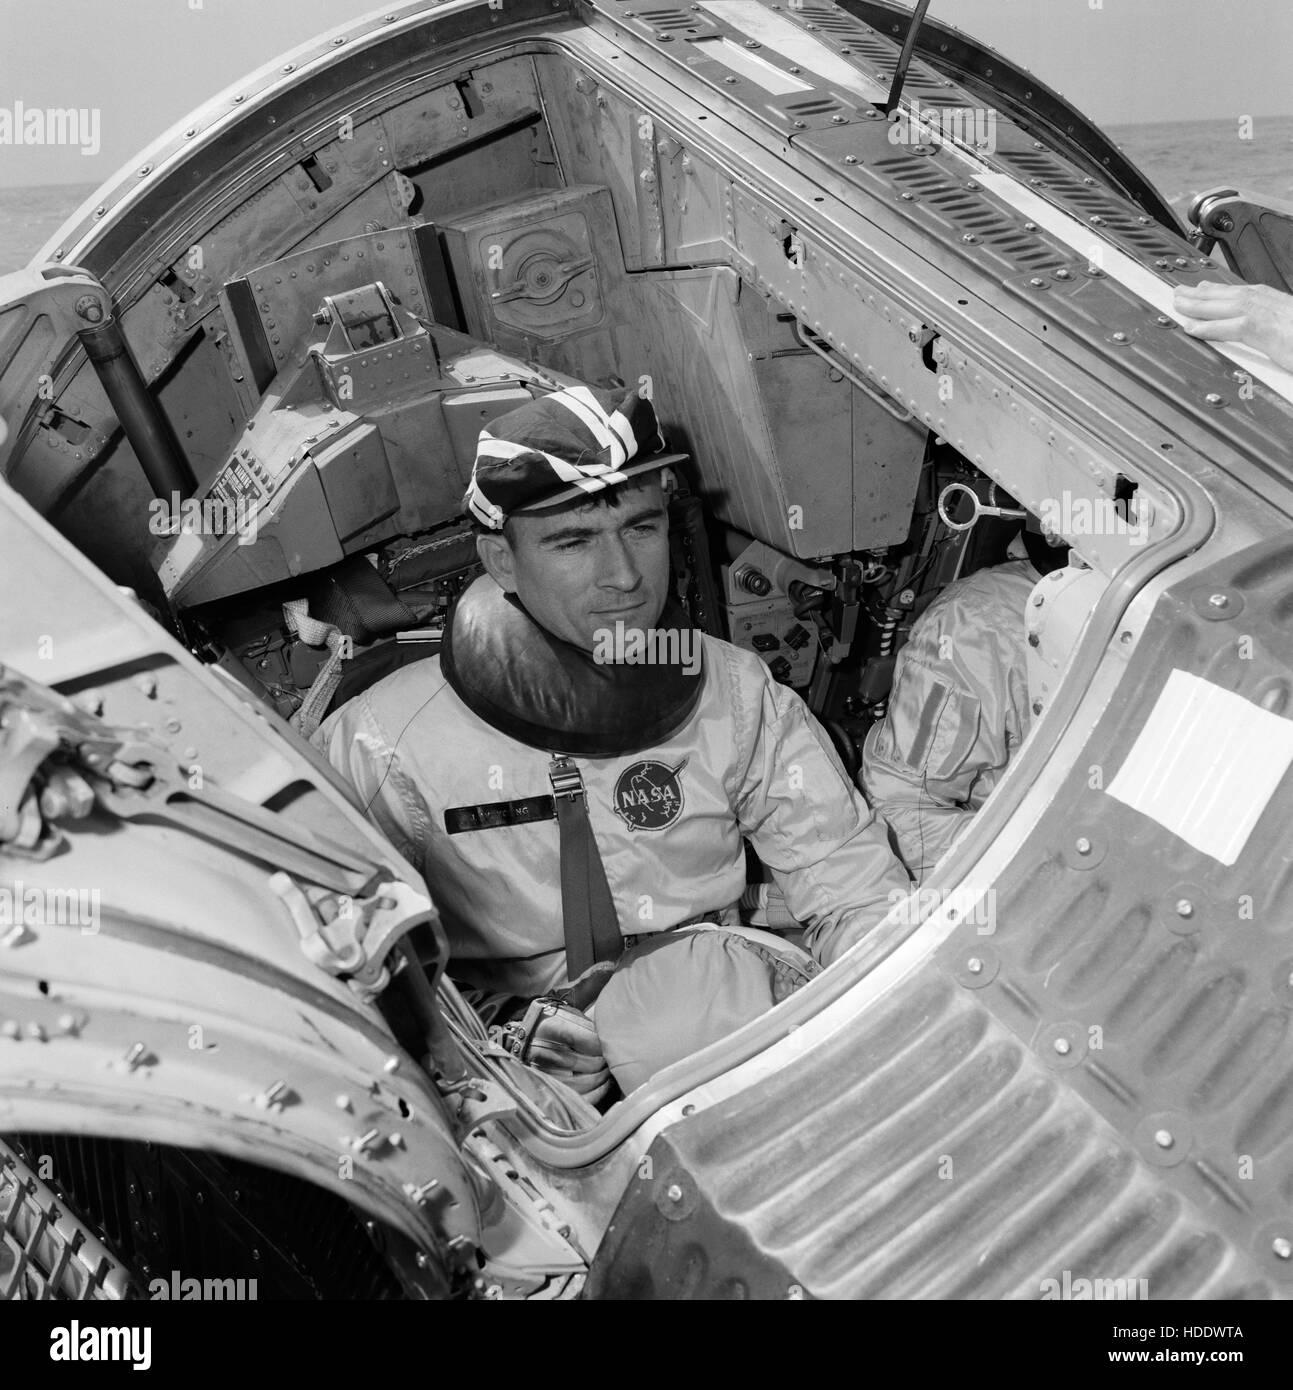 Resultado de imagen para John Young Astronaut